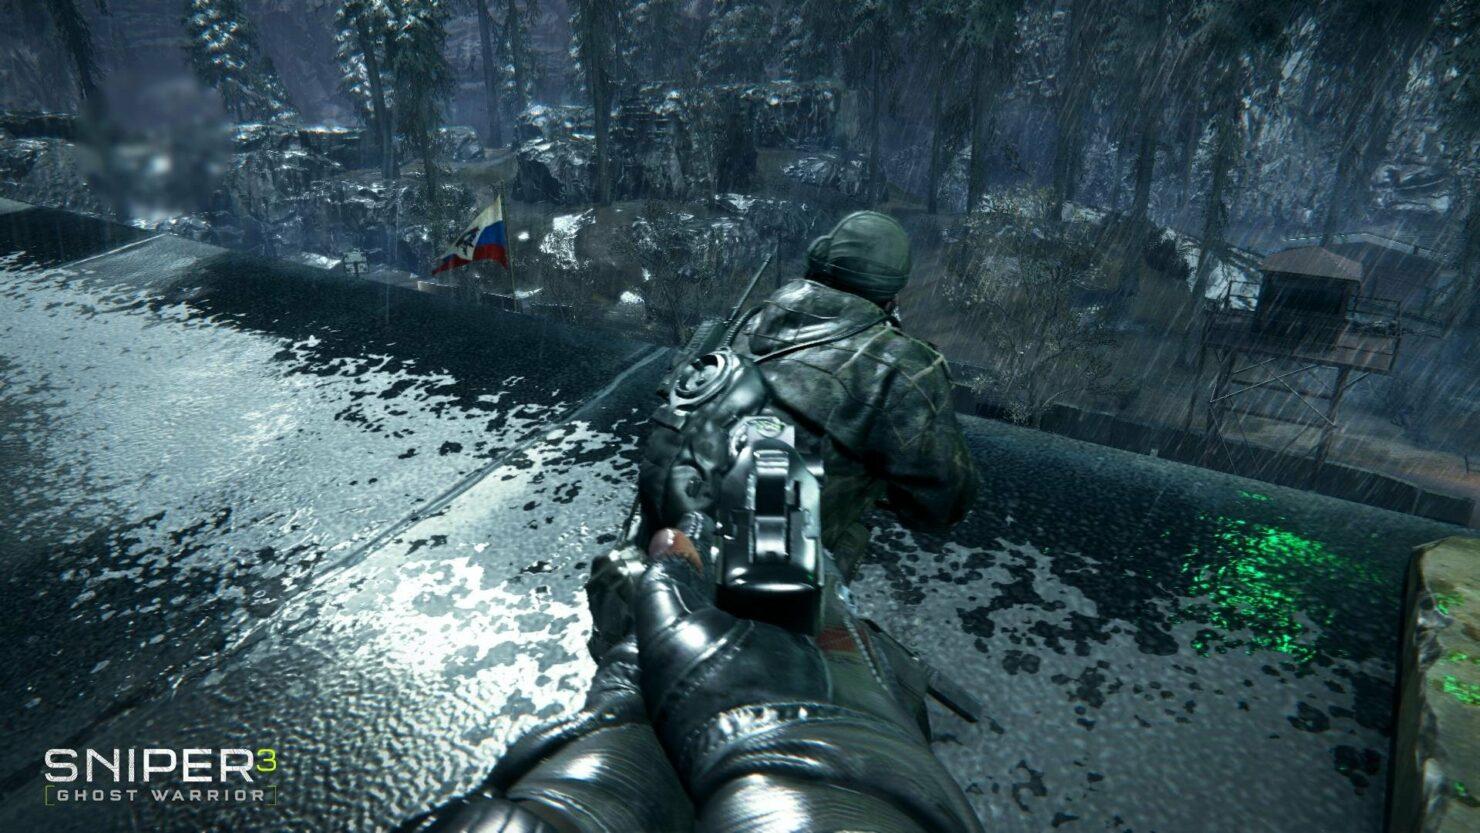 sniper-ghost-warrior-3-9